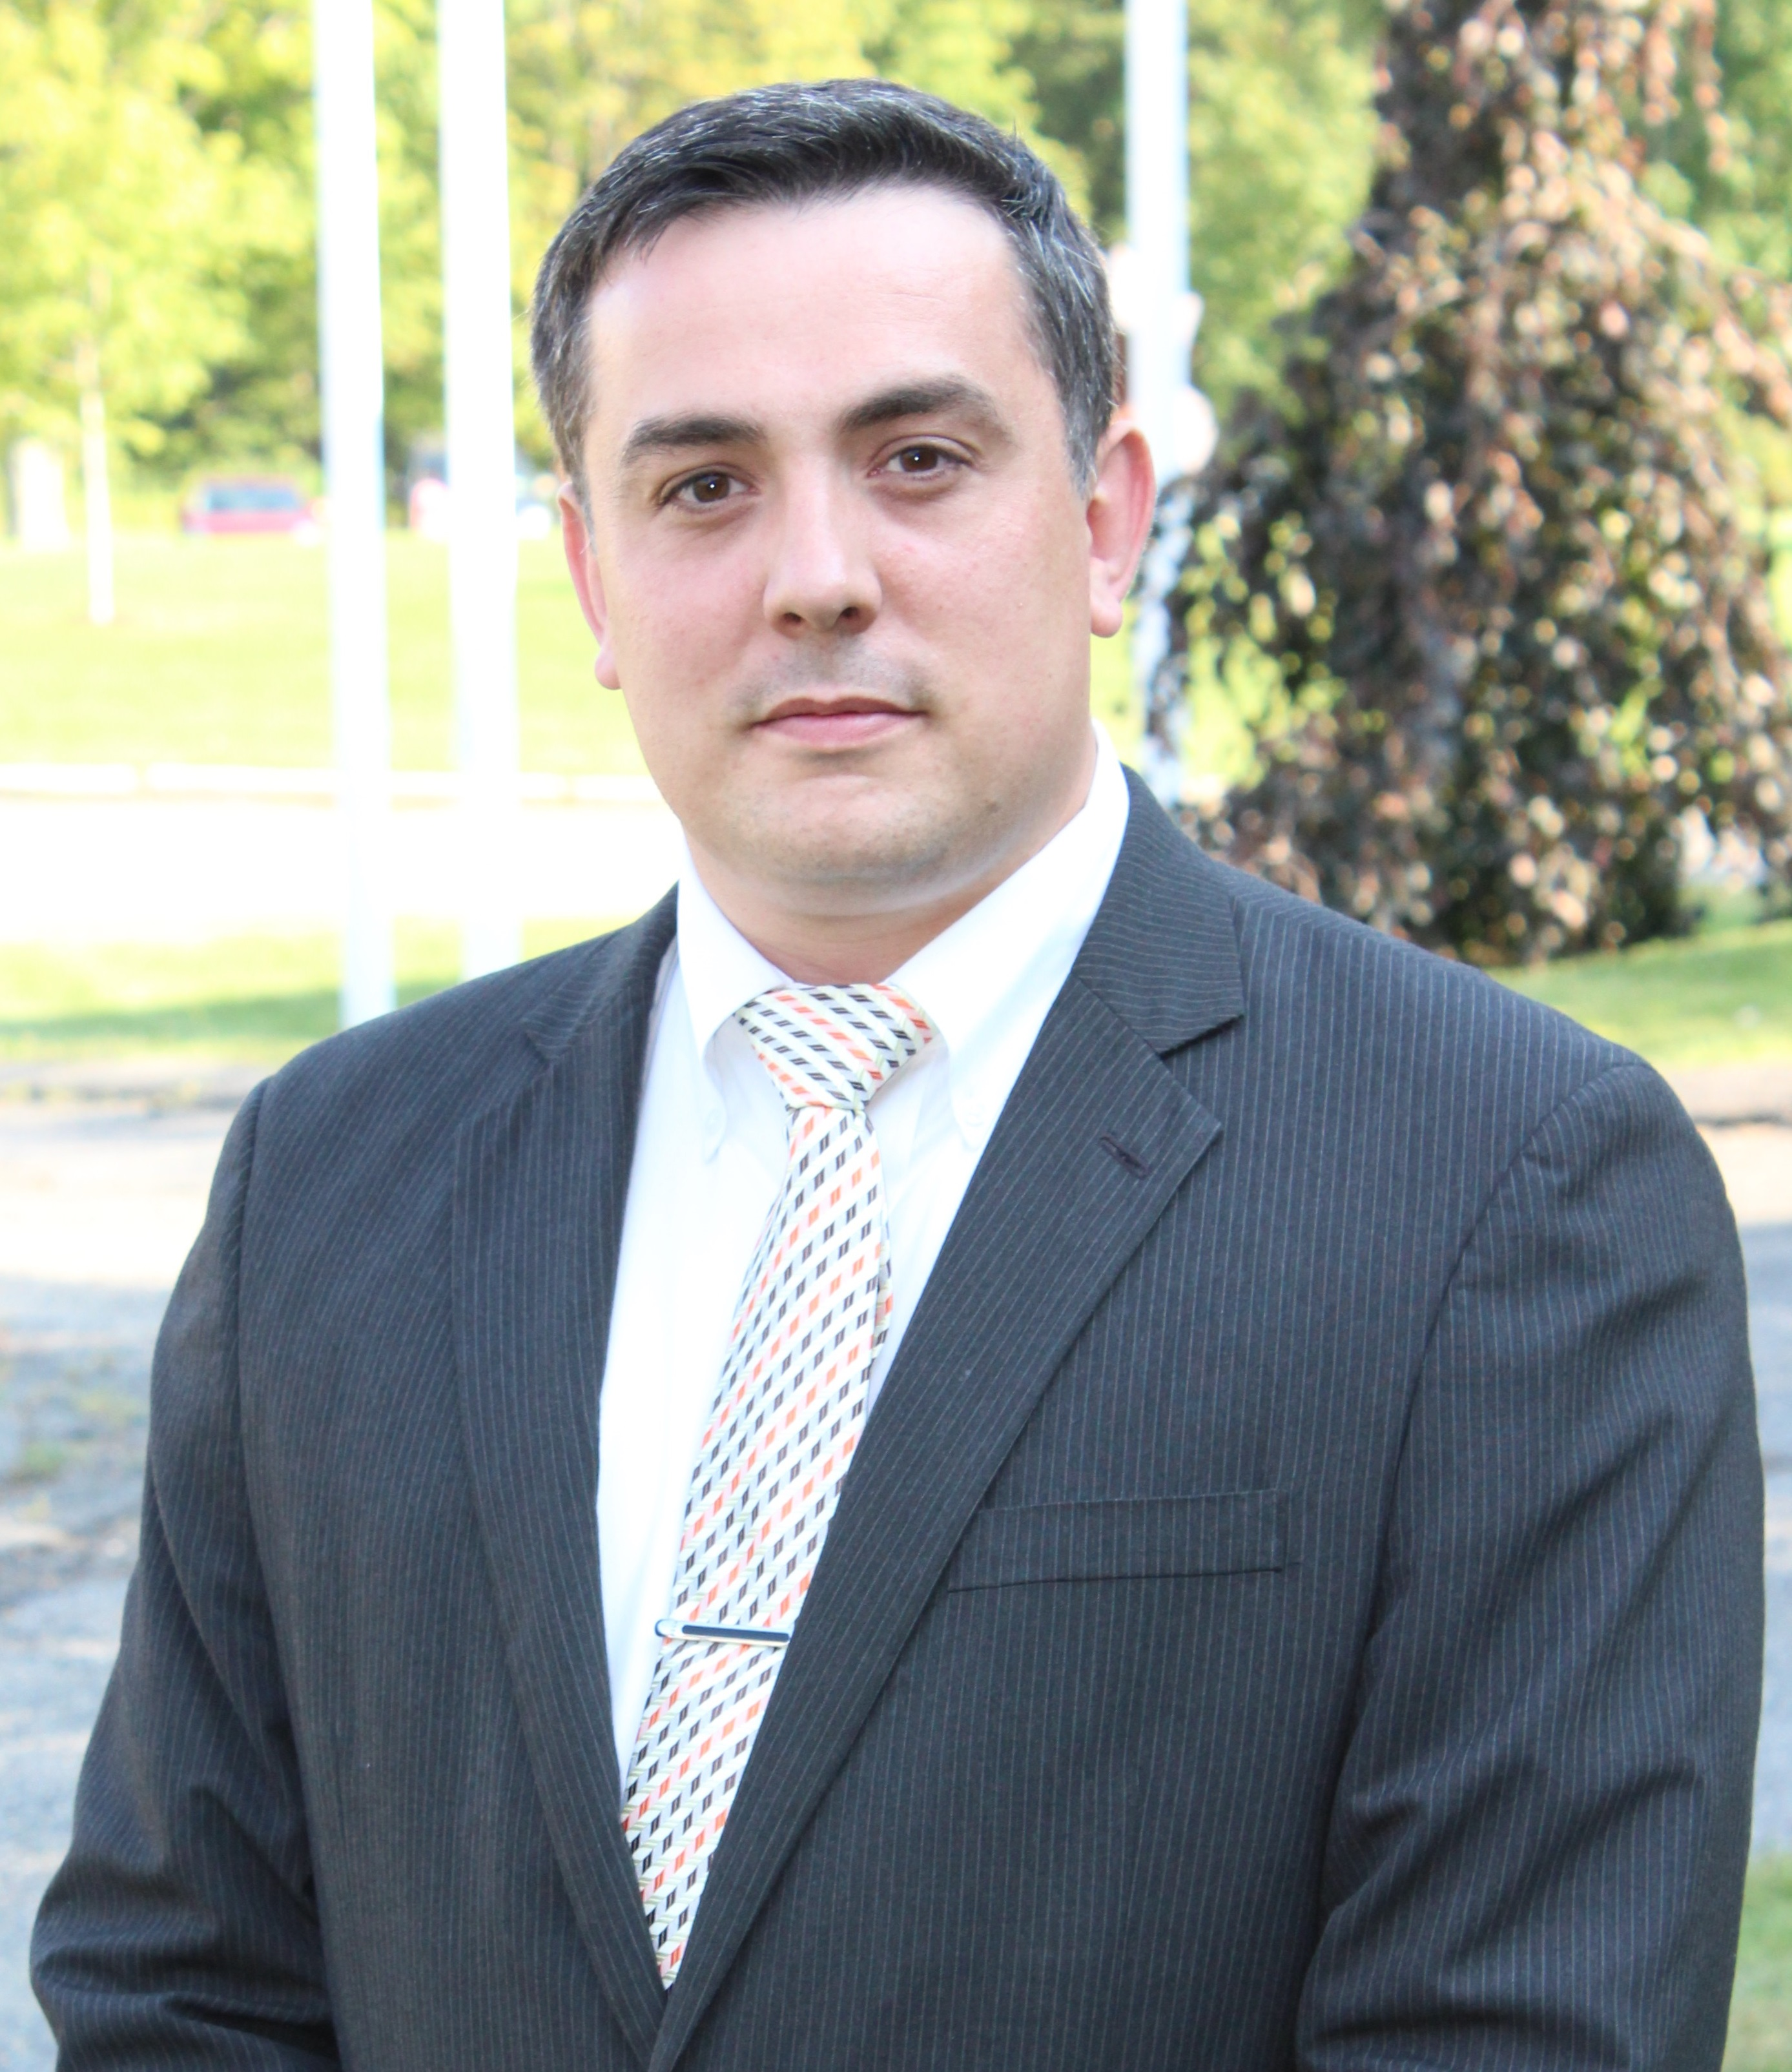 David Lesure